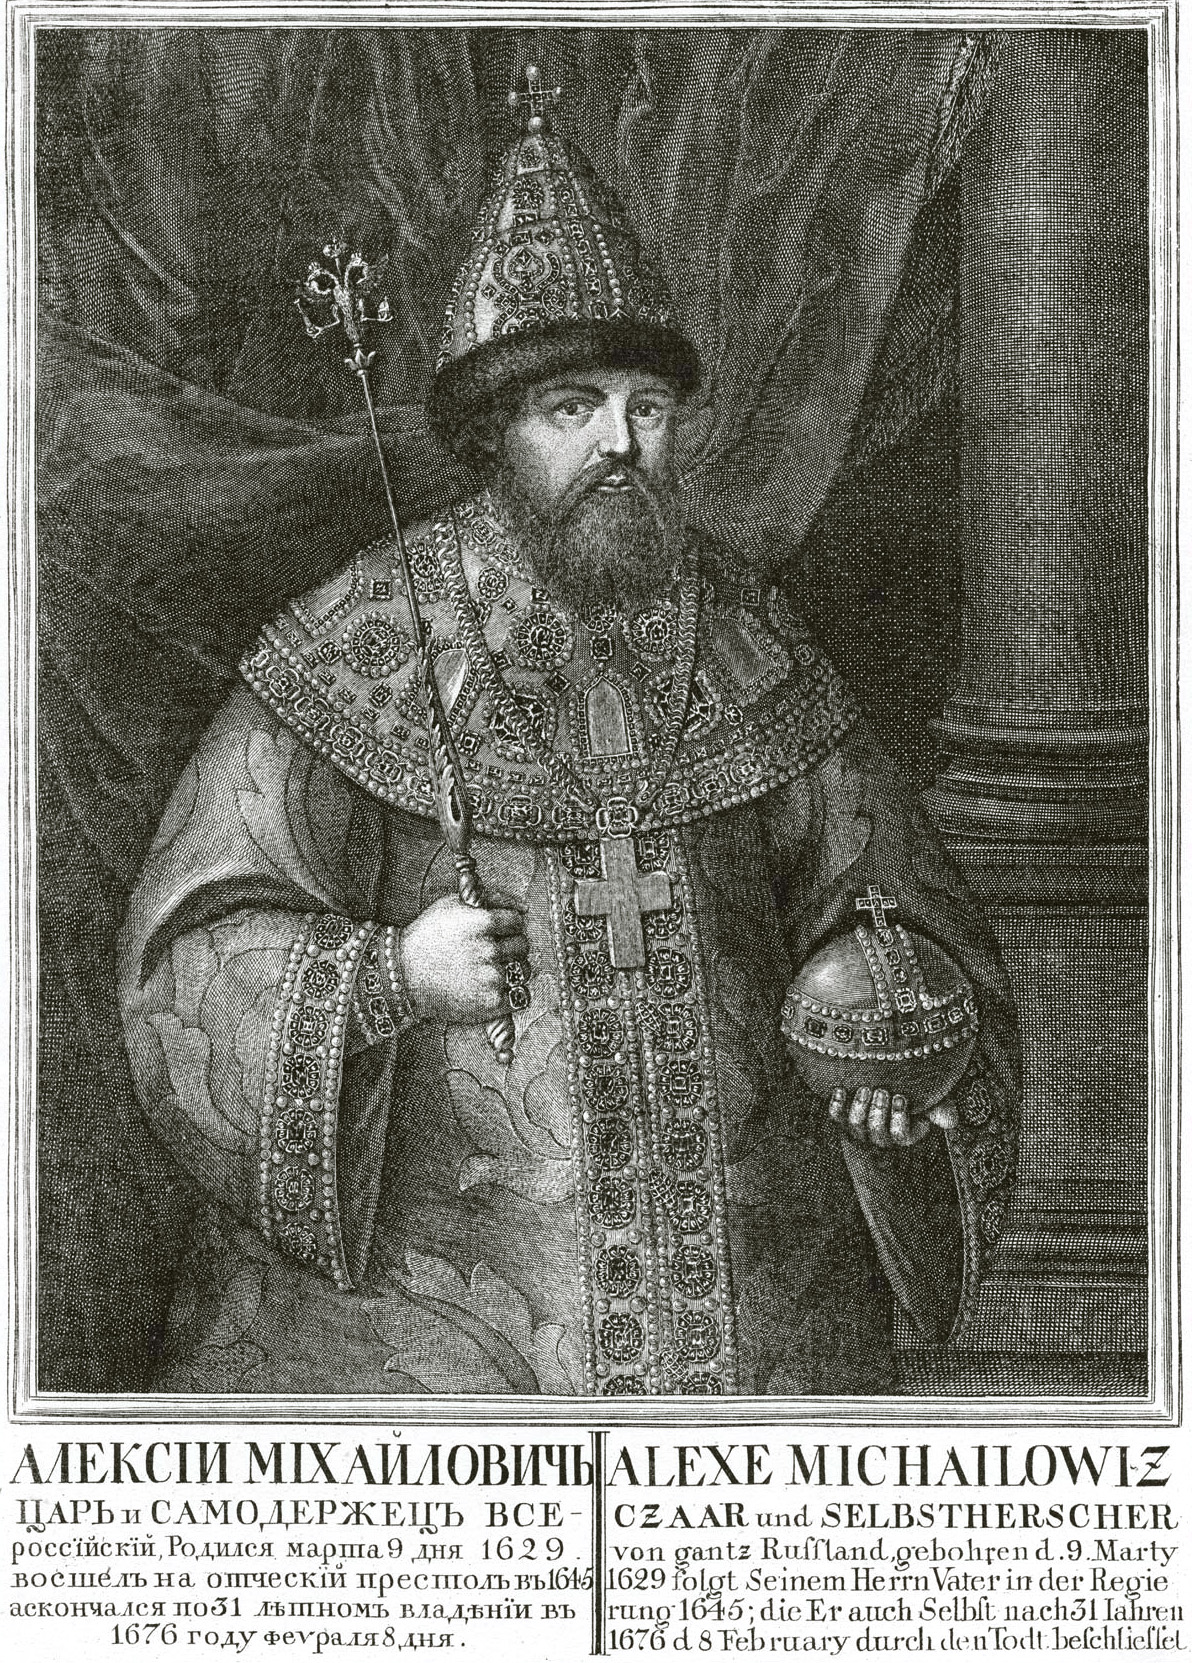 88. Портрет Царя Алексея Михайловича, гравир. Вортманом